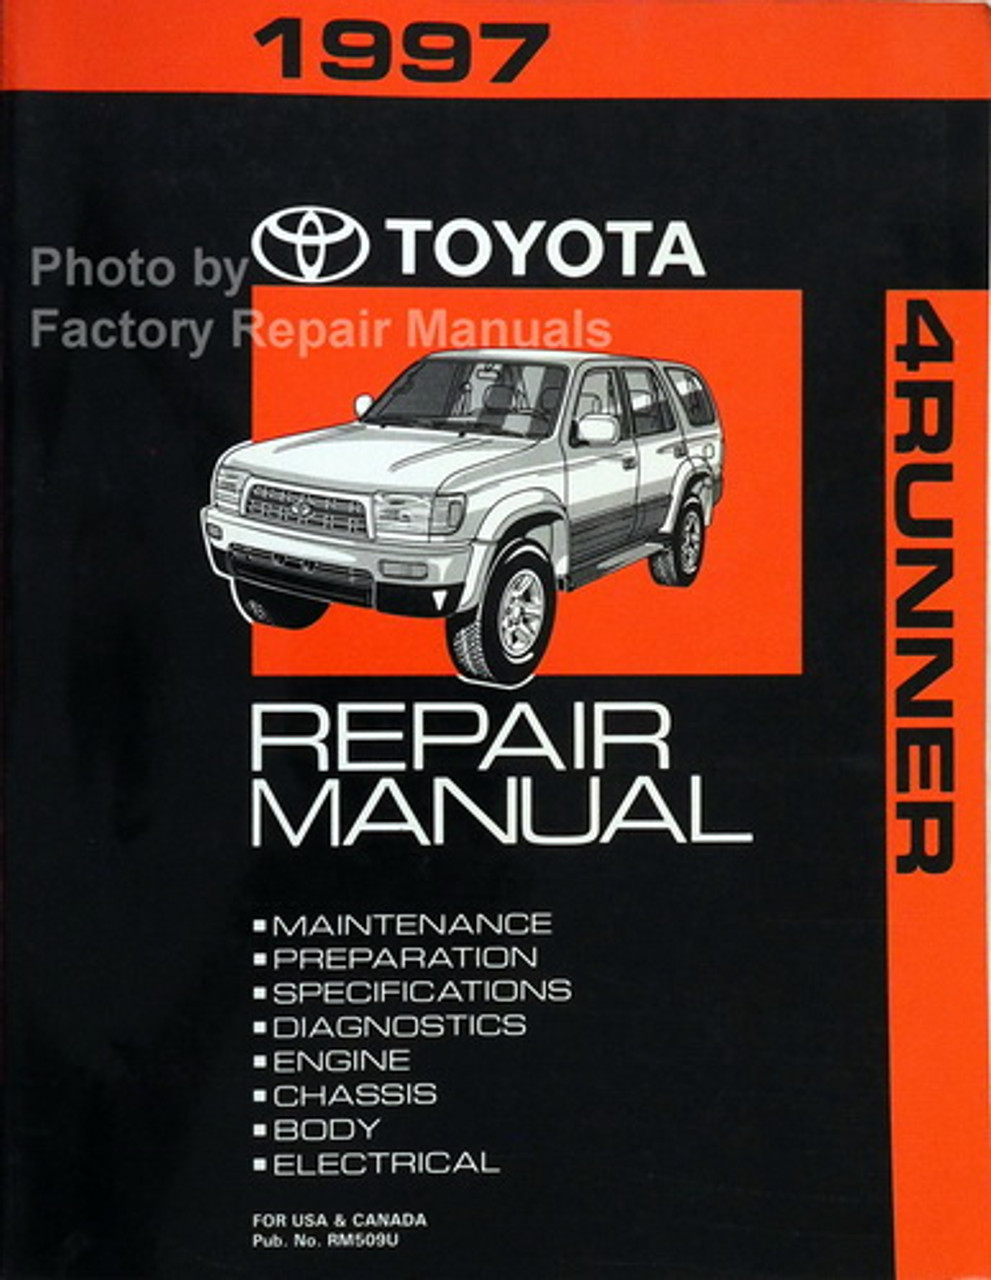 1997 Toyota 4runner Factory Service Manual Original Shop